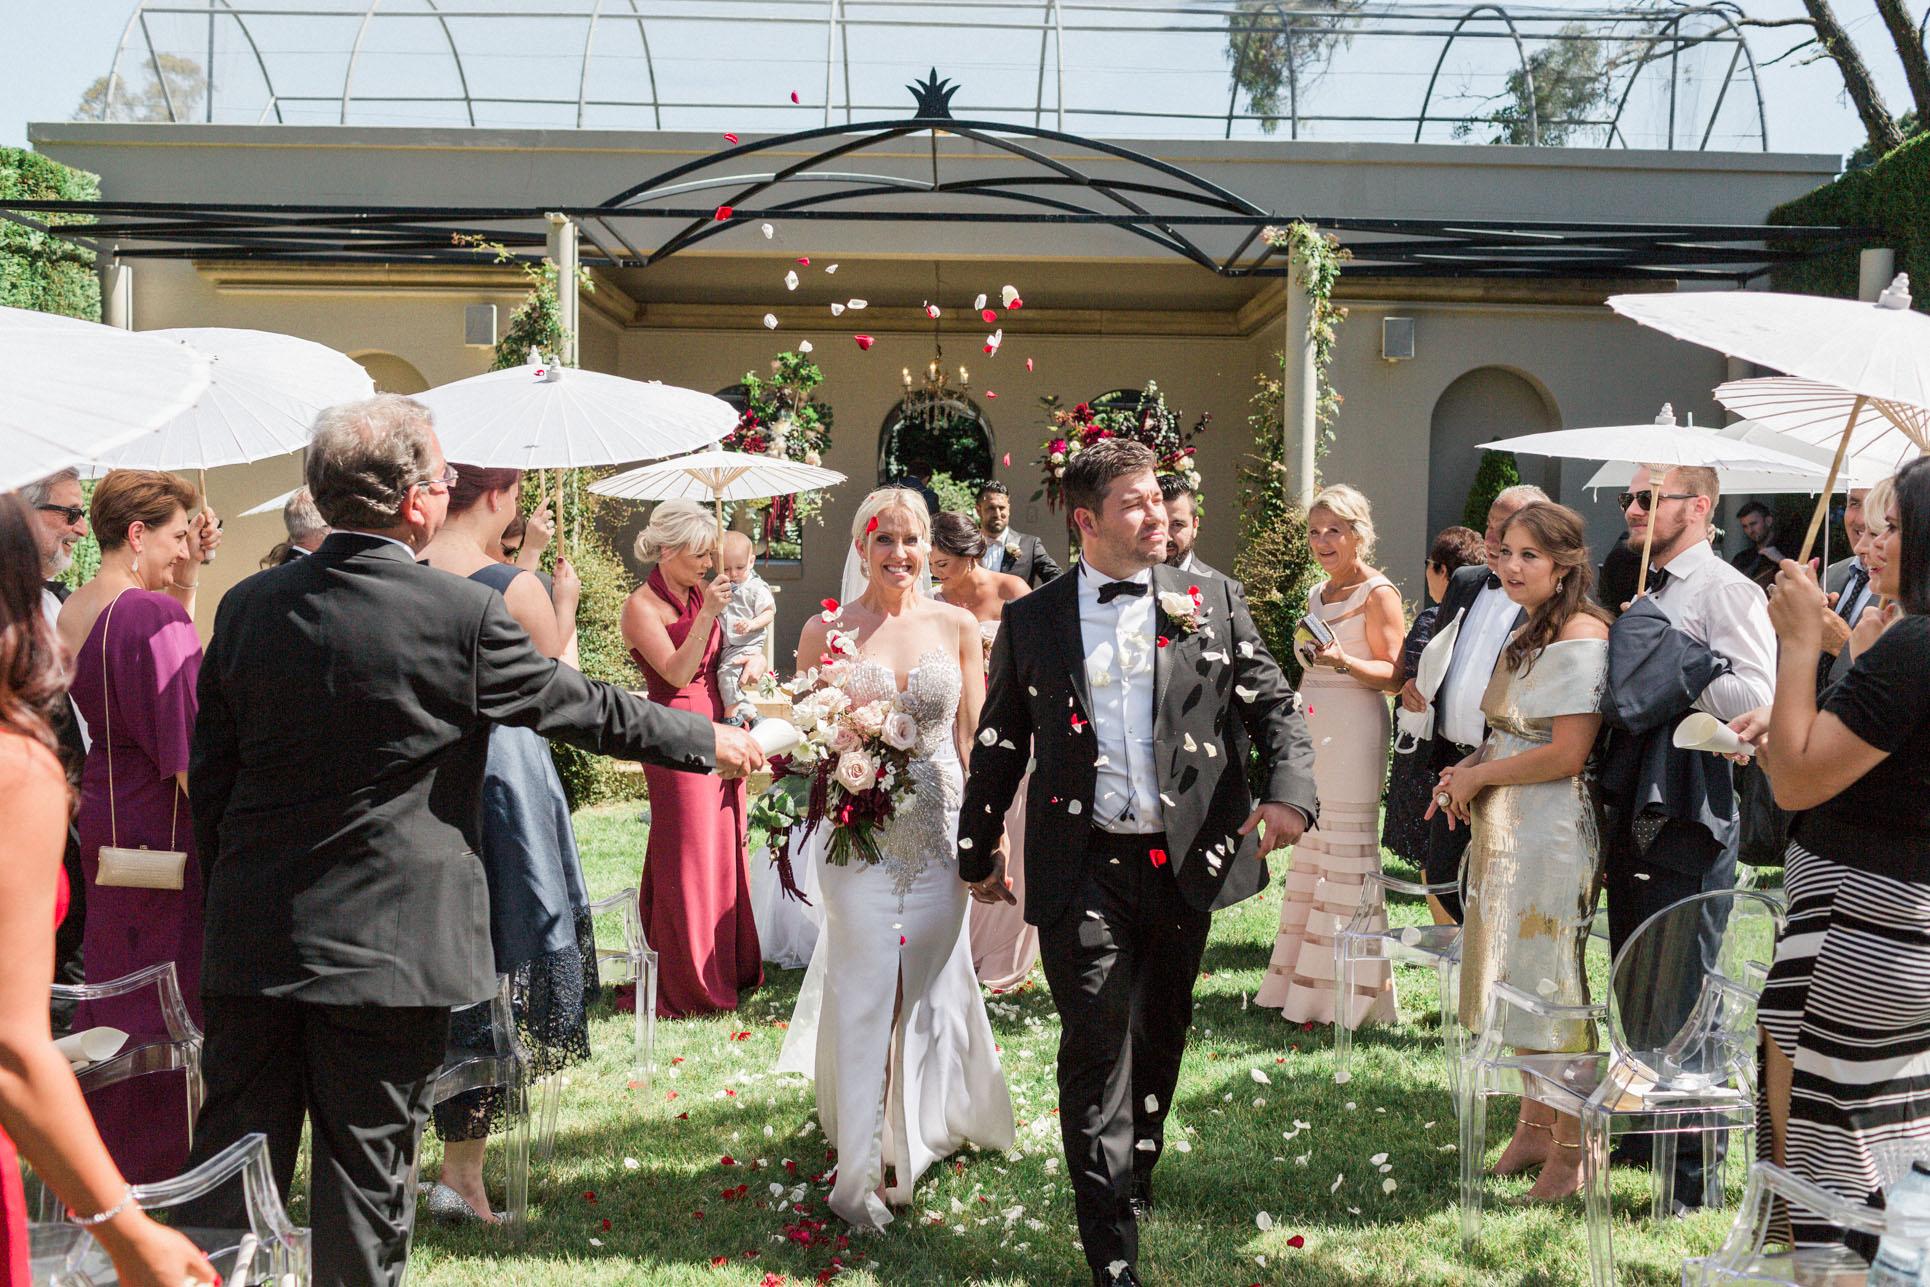 Hopewood House - Kylie & Gabriel - Wedding Day Gallery - Bowral Southern Highlands - ceremony and reception - shot 7 - Walk Celebrations n petals.jpeg